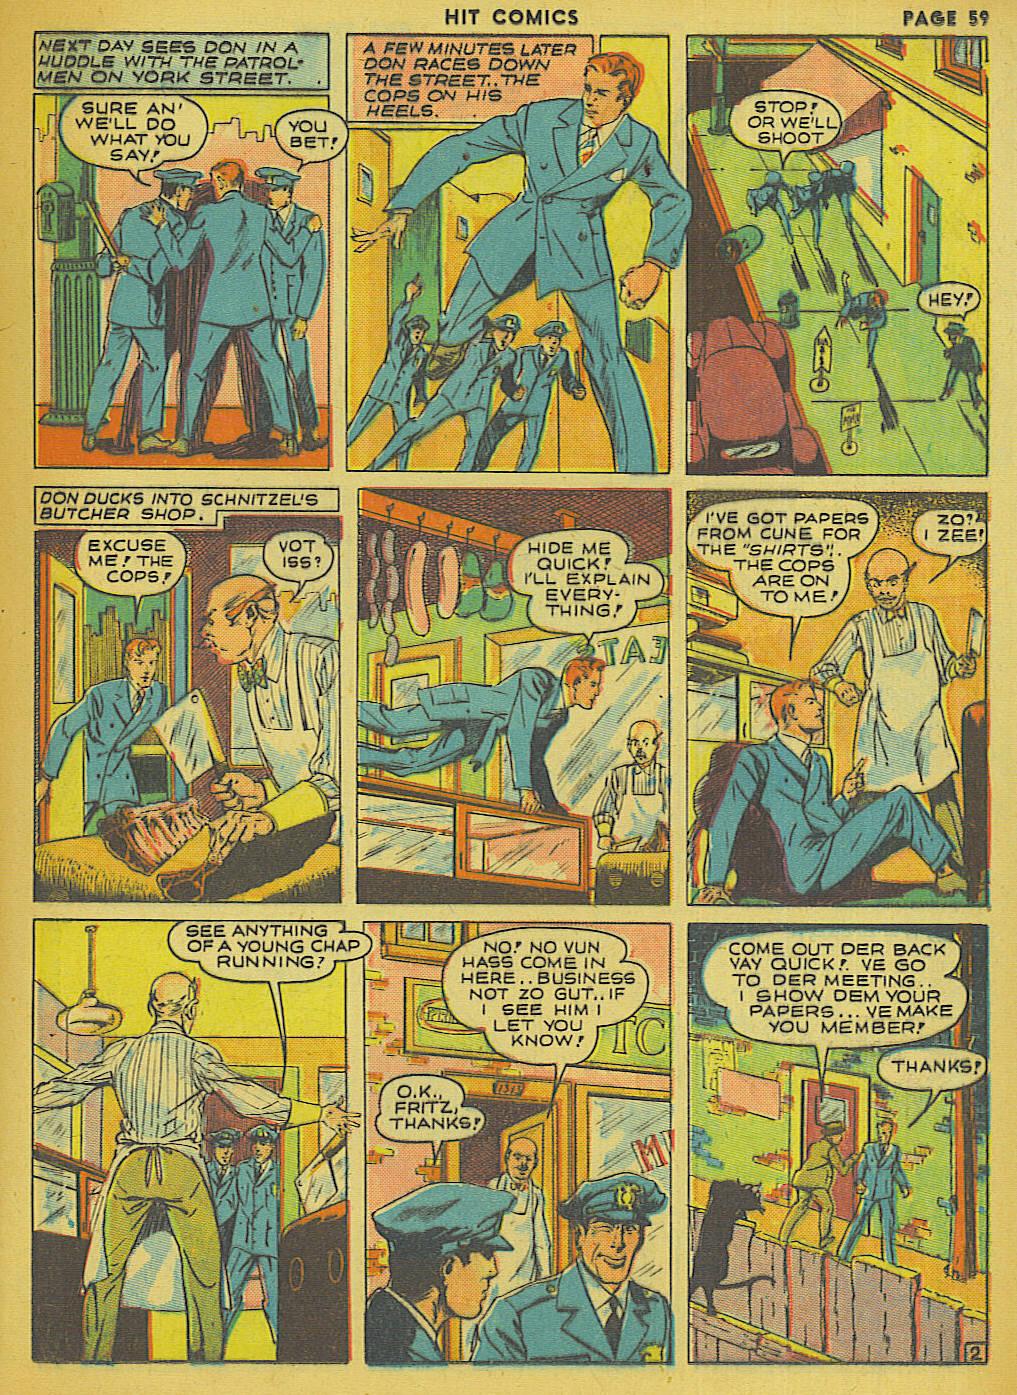 Read online Hit Comics comic -  Issue #13 - 61